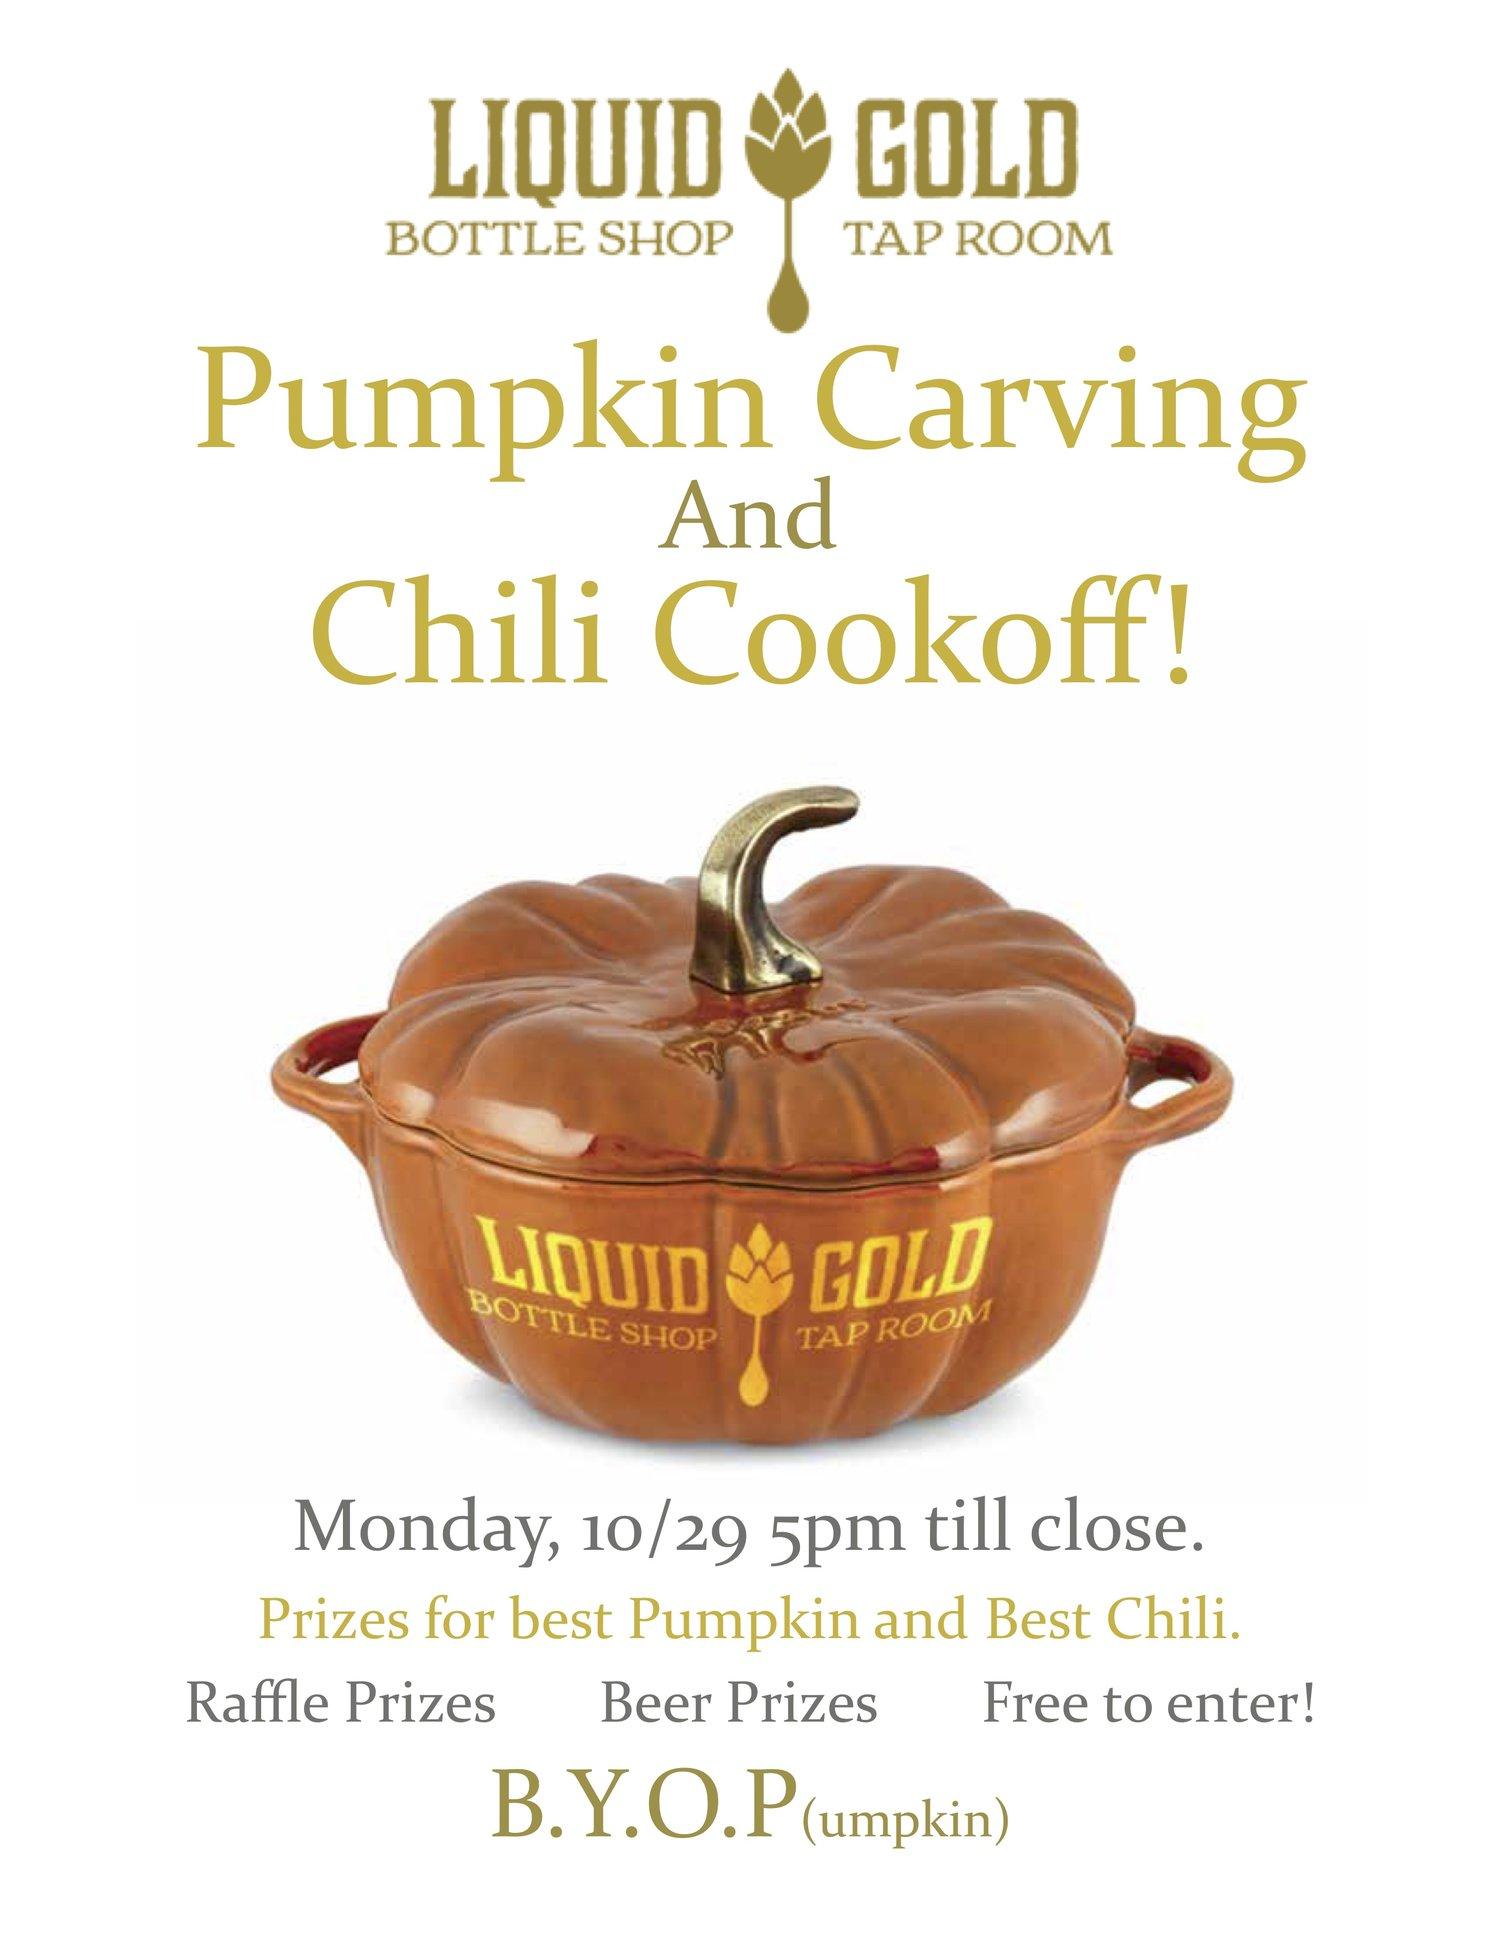 Annual Pumpkin Carving Contest & Chili Cook Off! — Liquid Gold